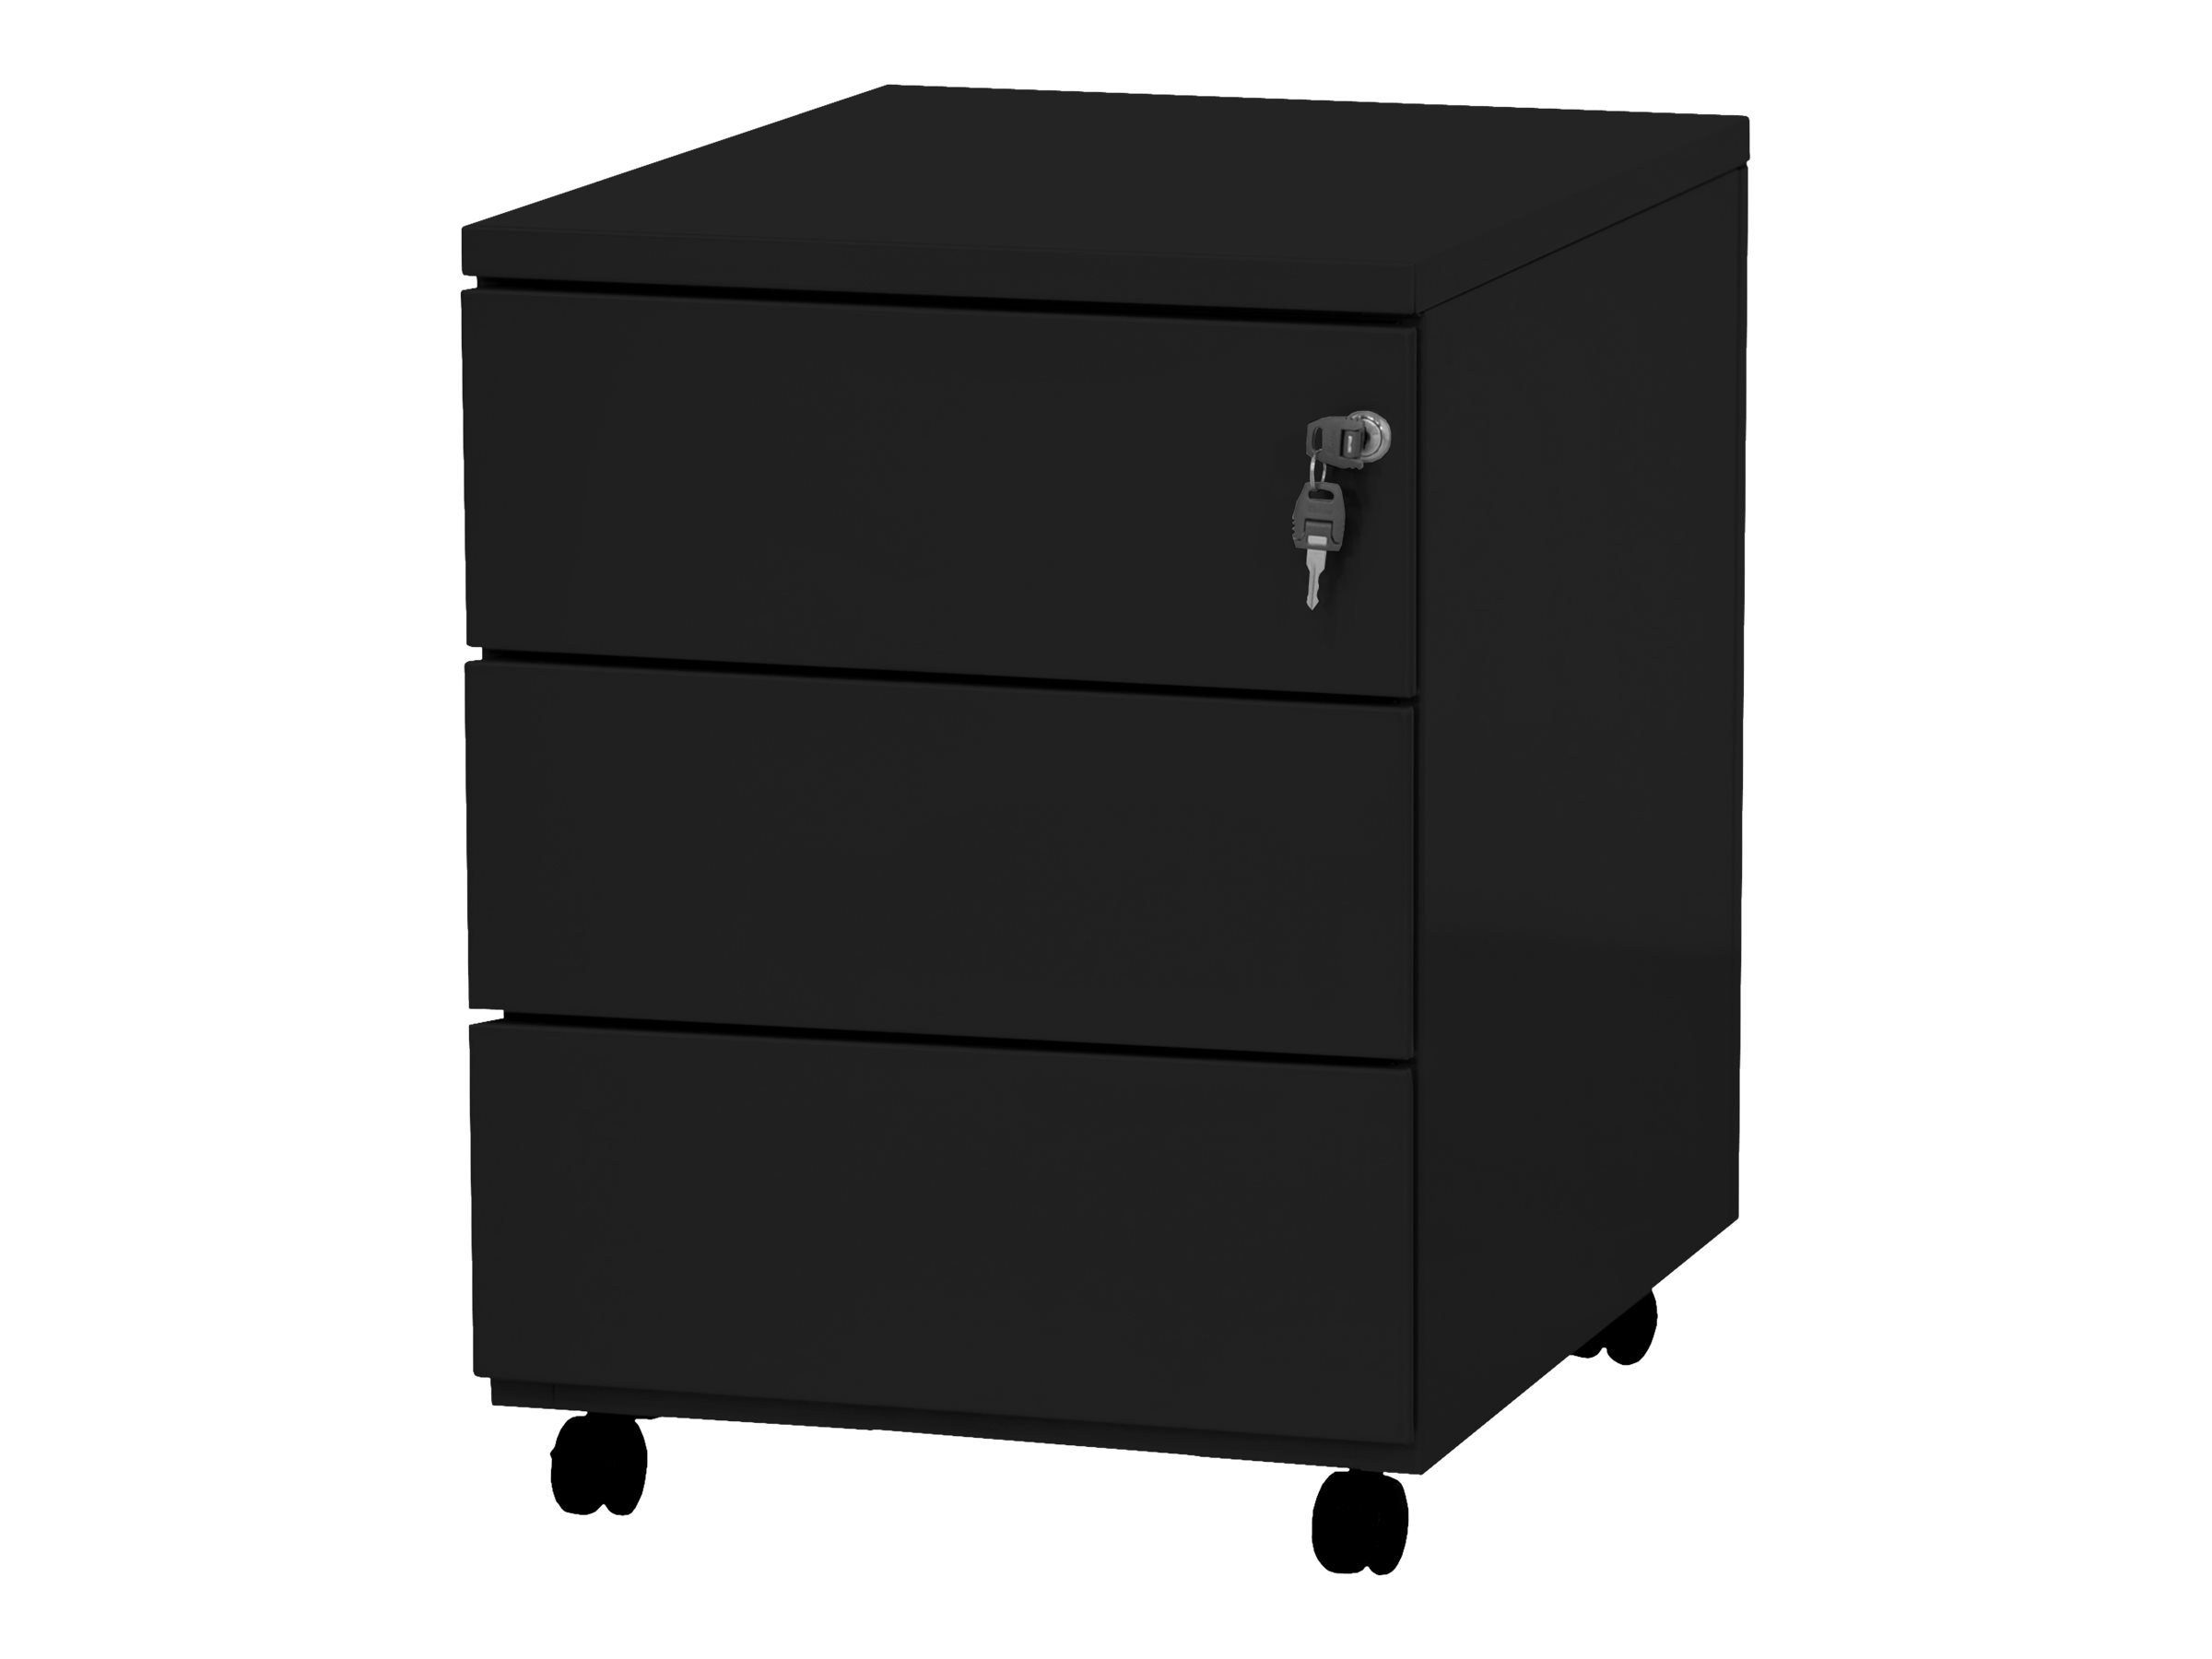 Caisson mobile - 3 tiroirs - noir - 56,7 x 54,1 x 41,8 cm